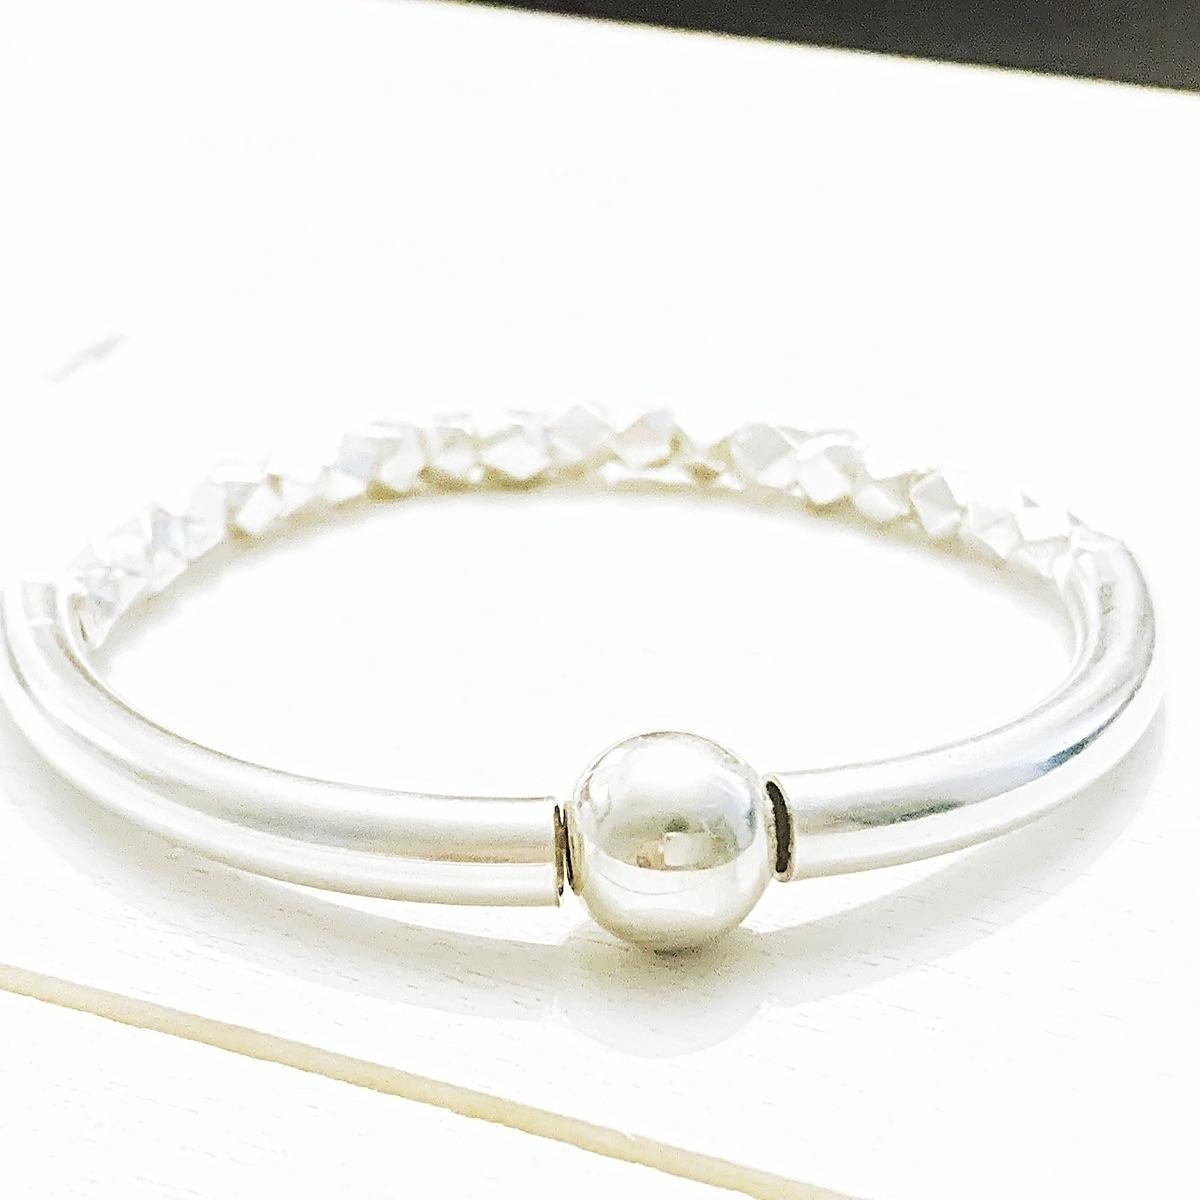 RakSen Customized Jewelry (@raksen) Cover Image